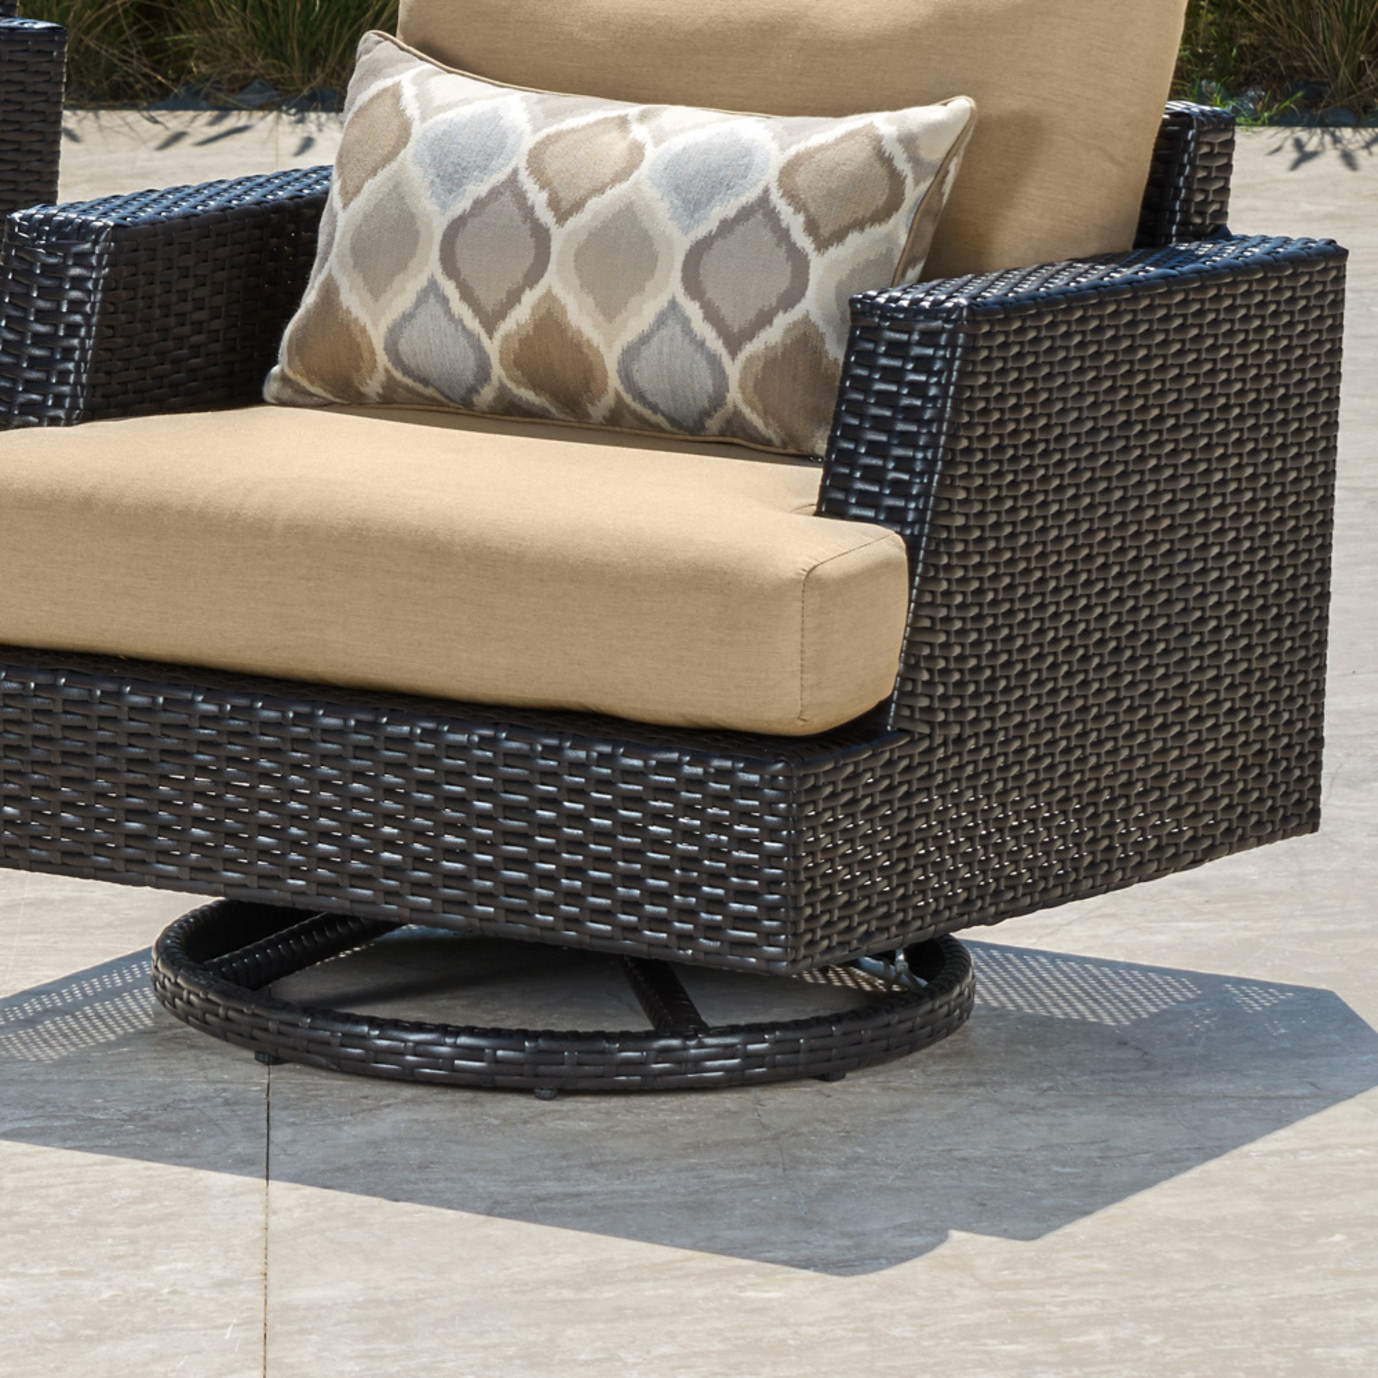 Portofino® Comfort 5pc Fire Chat Set - Heather Beige